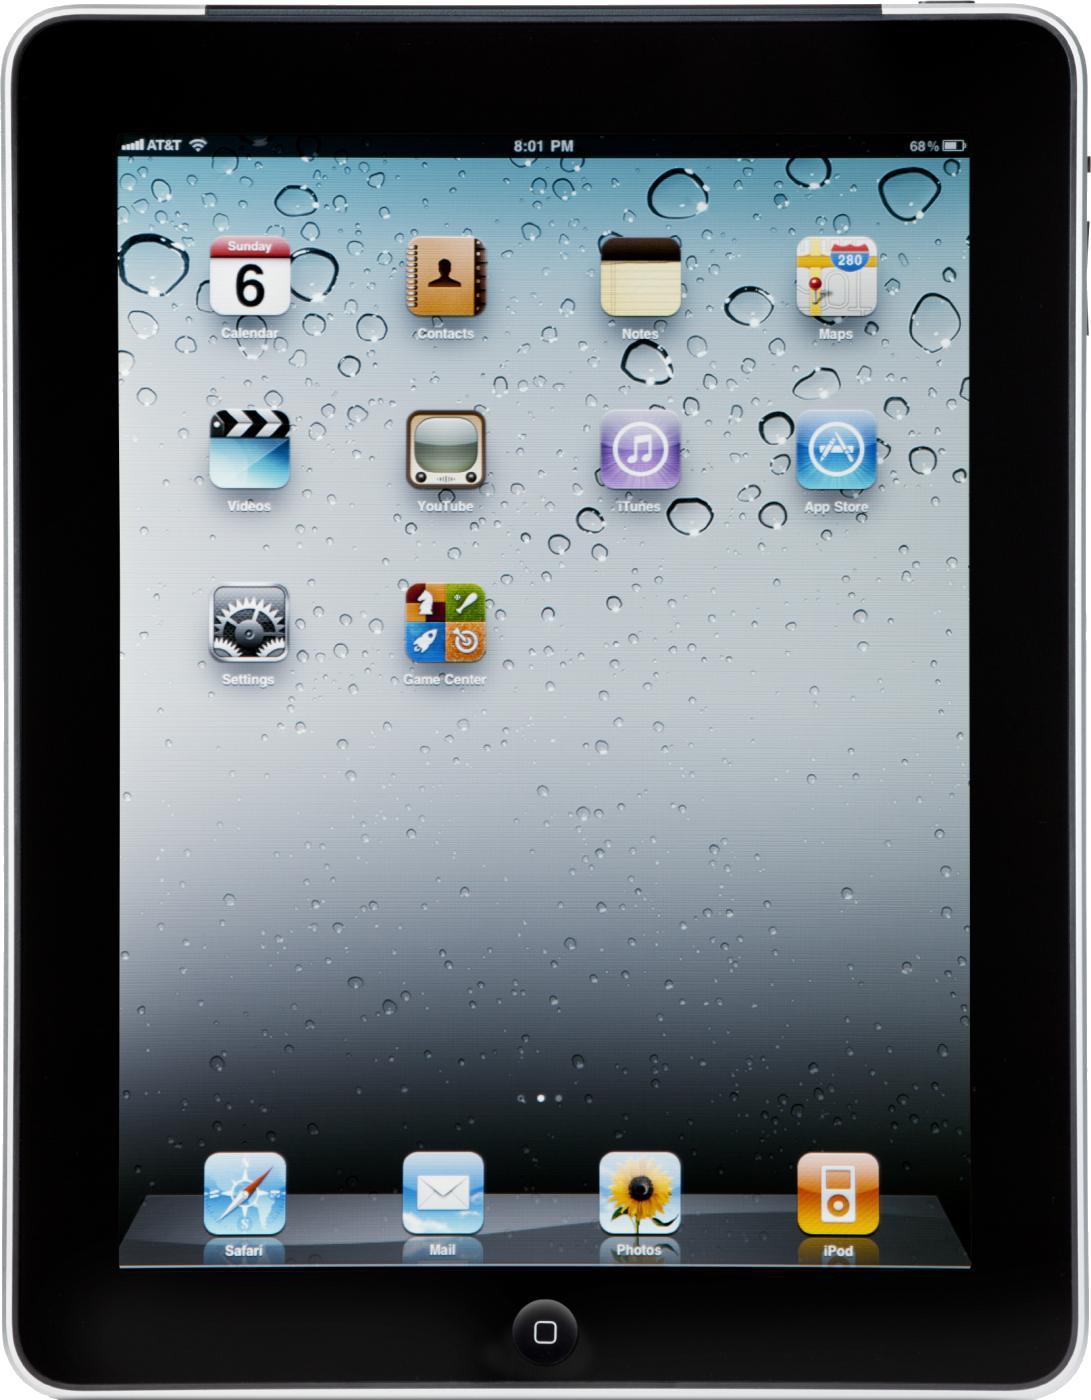 Apple iPad 2 16GB Wifi + 3G